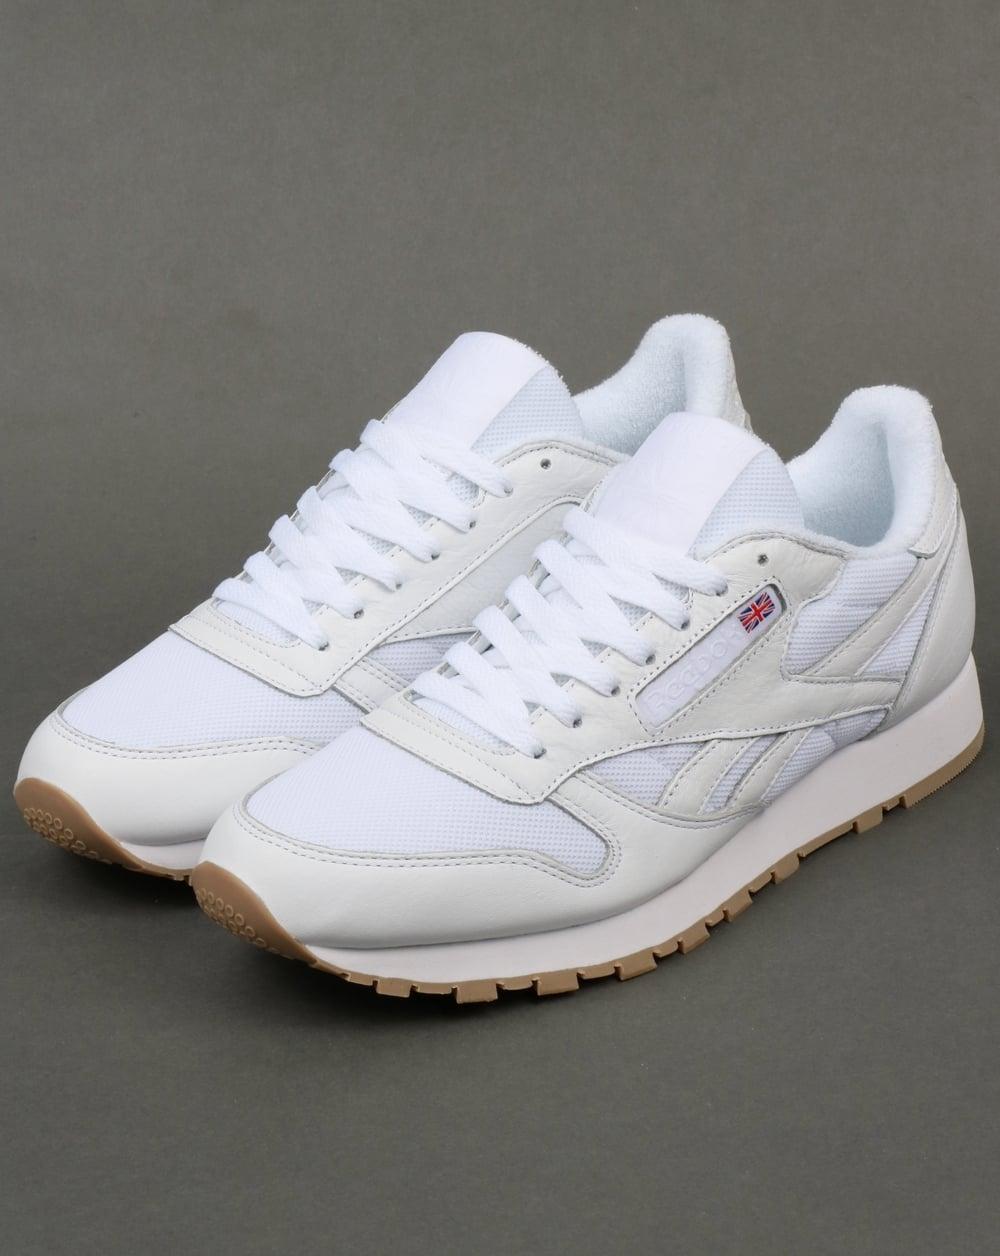 Reebok Classic Leather ESTL Trainers White afbfdb69a